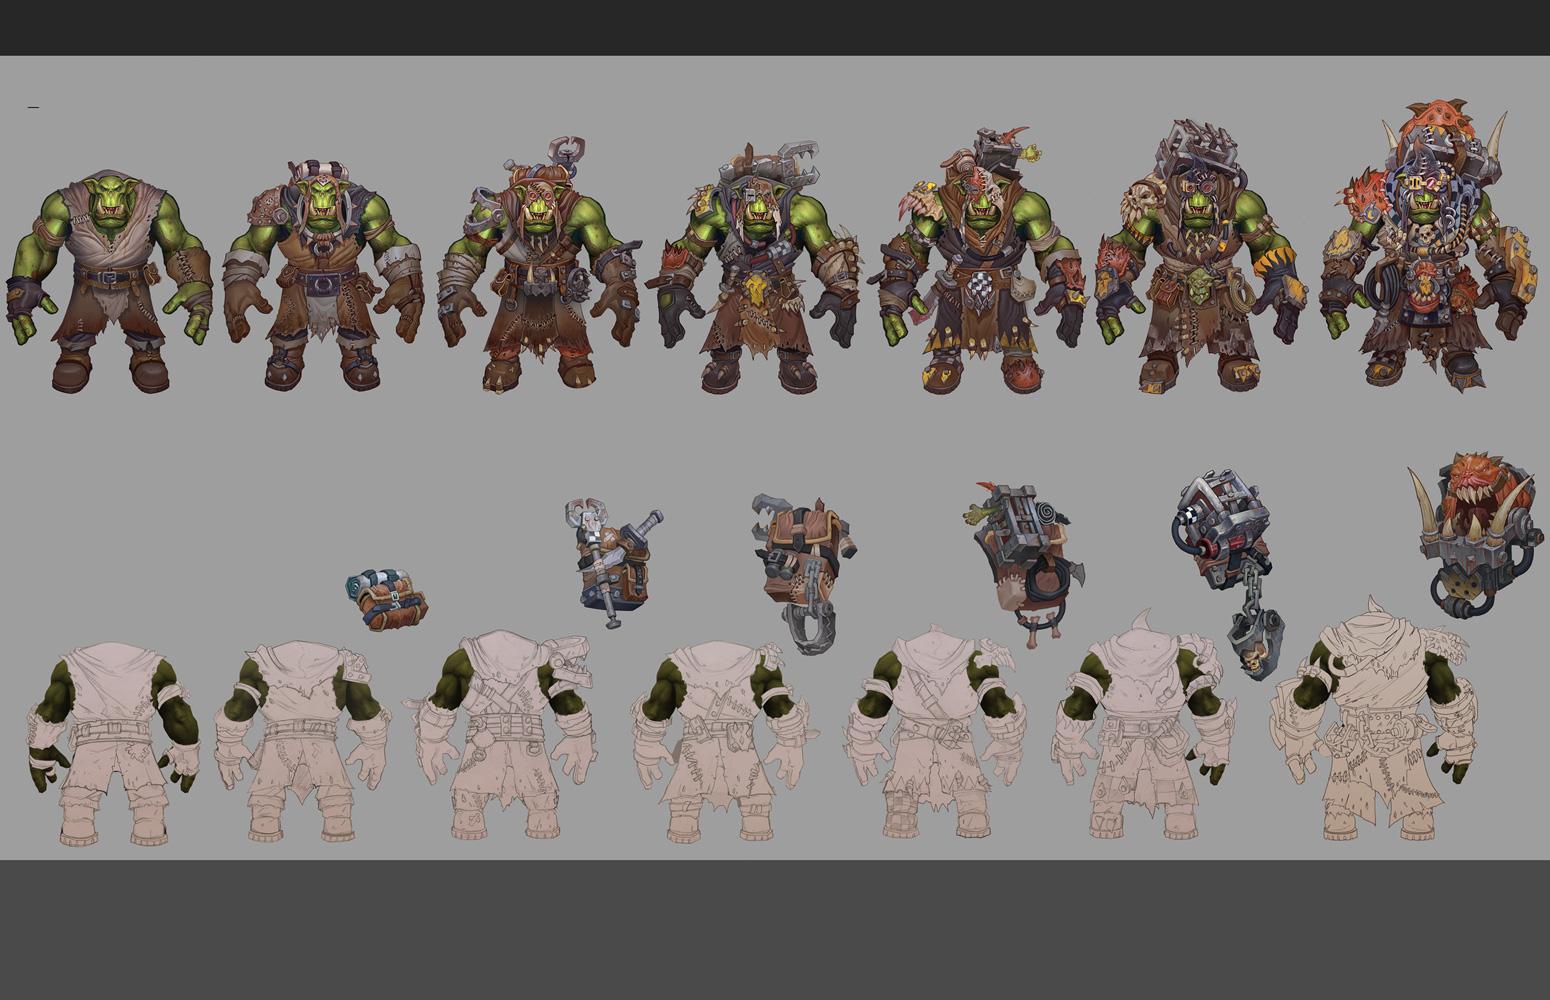 [E3] Eternal Crusade, un MMO Warhammer 40K - Page 3 18